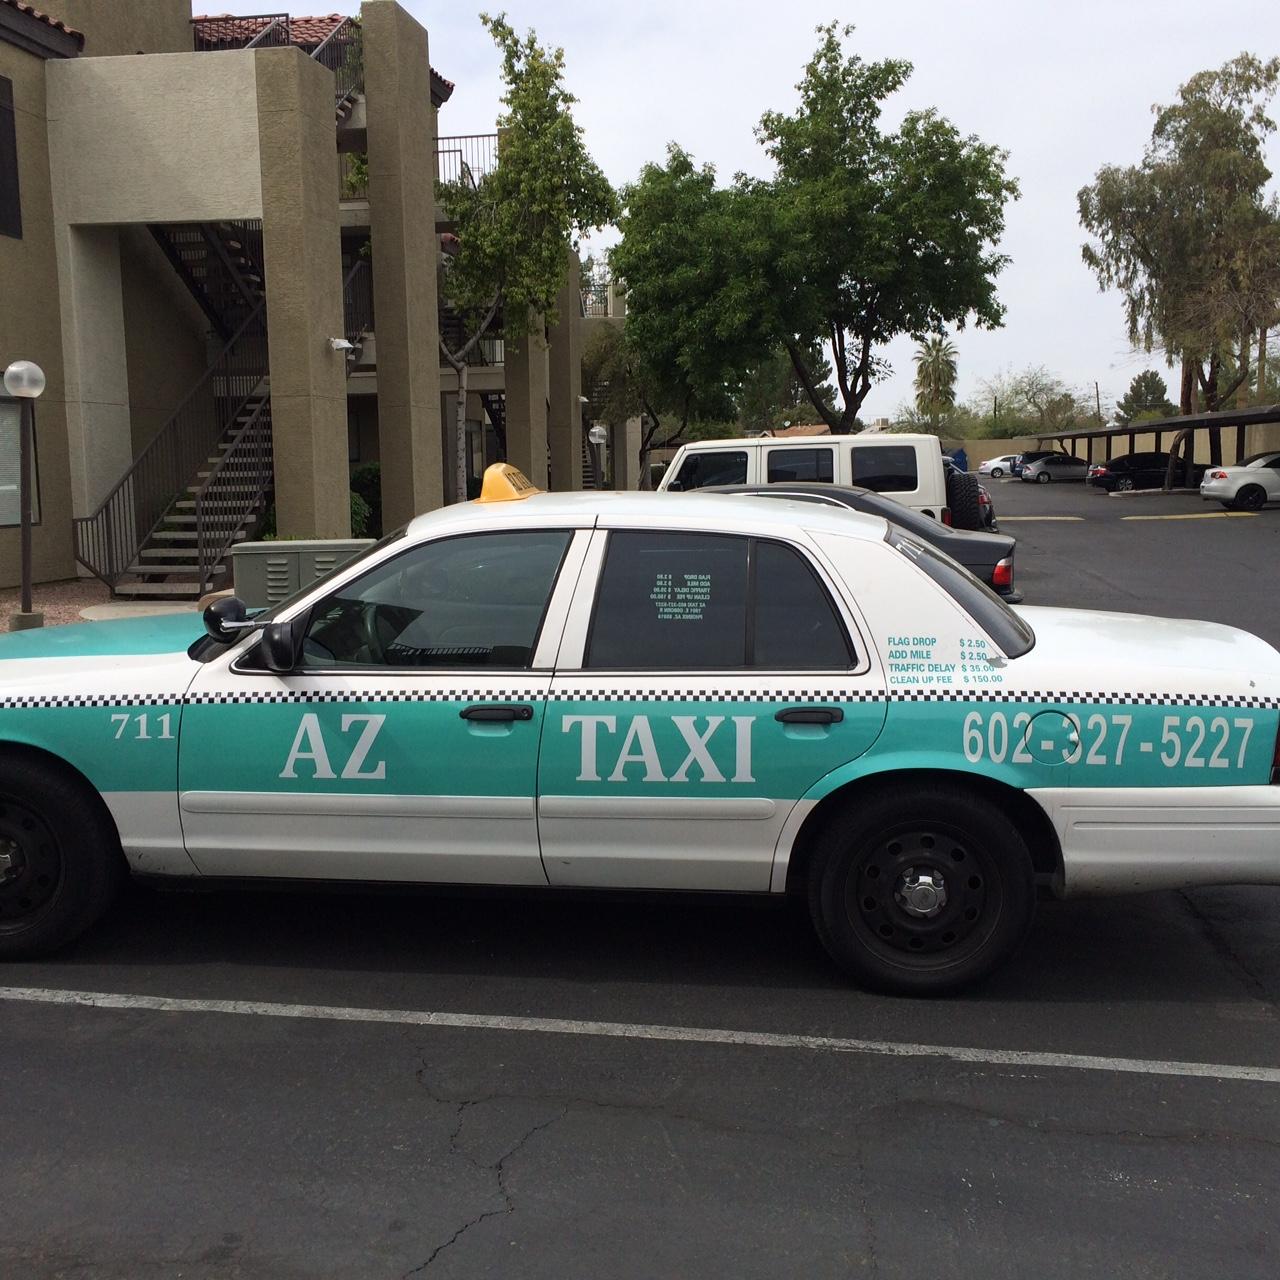 AZ Taxi image 1